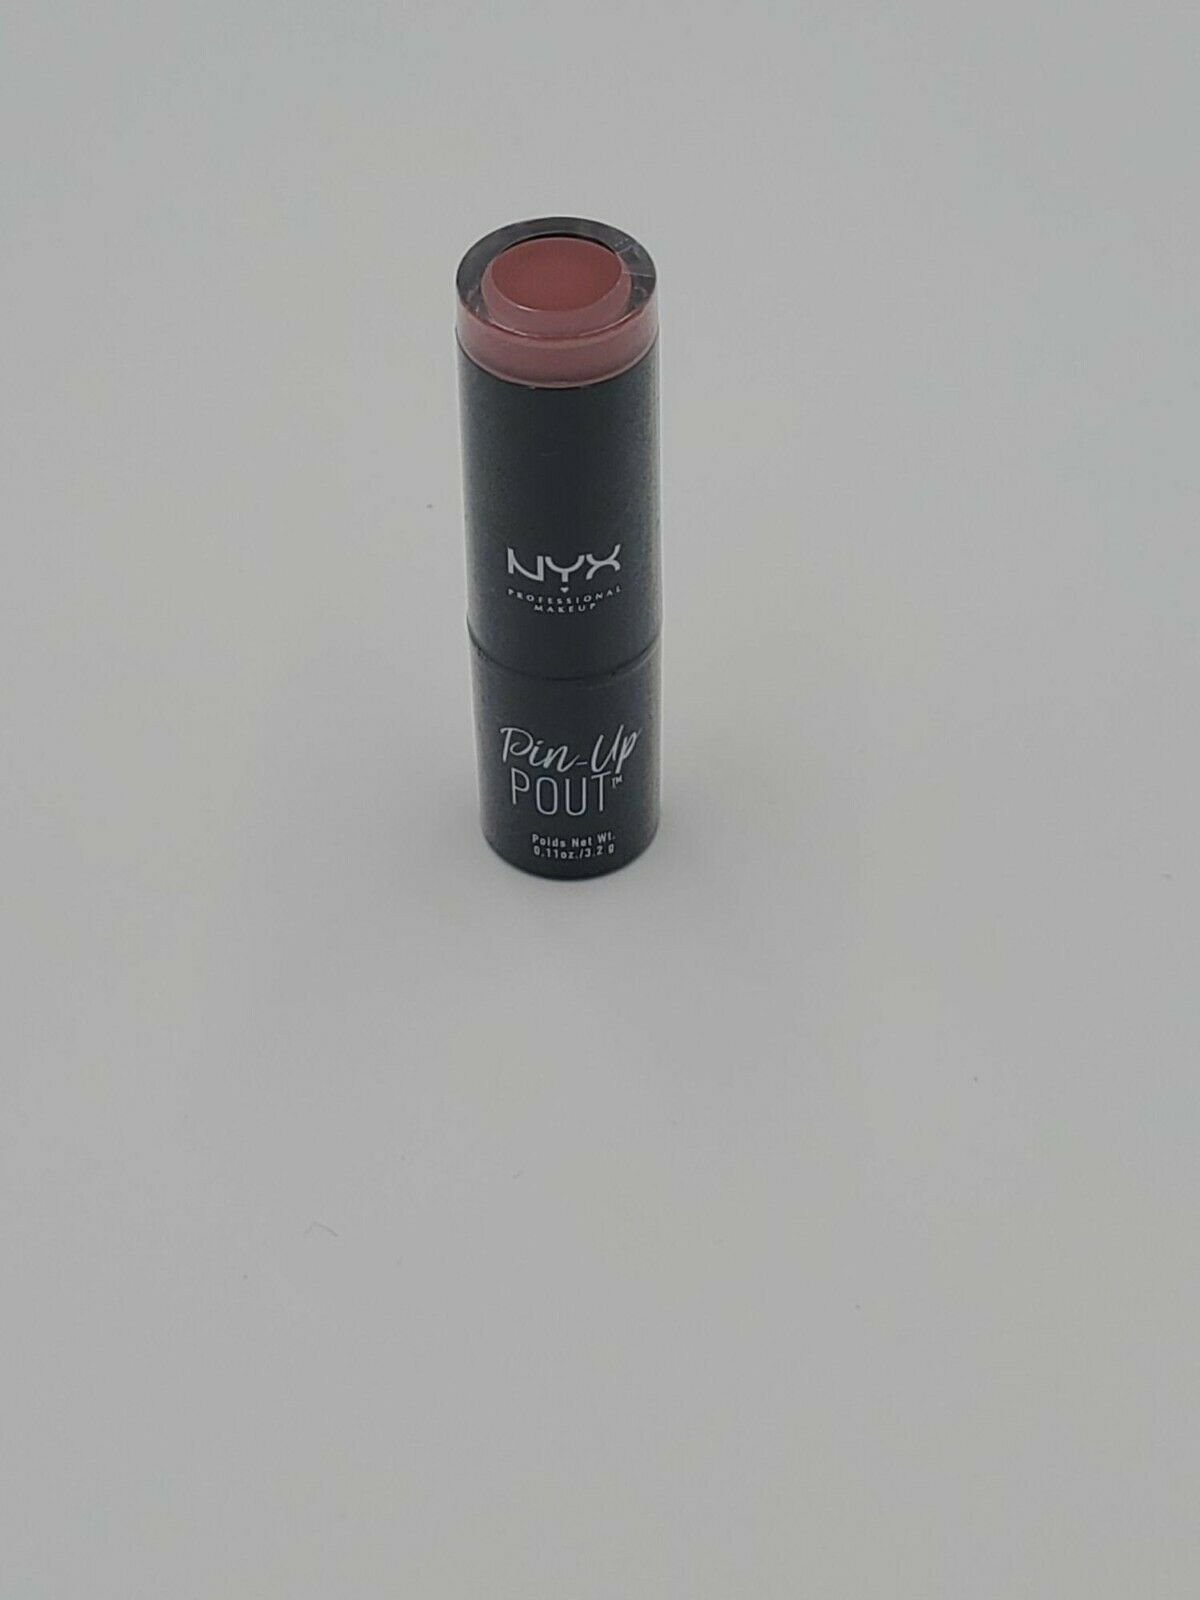 nyx lipstick professional makeup pin up pout puls 02 boundless 0.11 oz